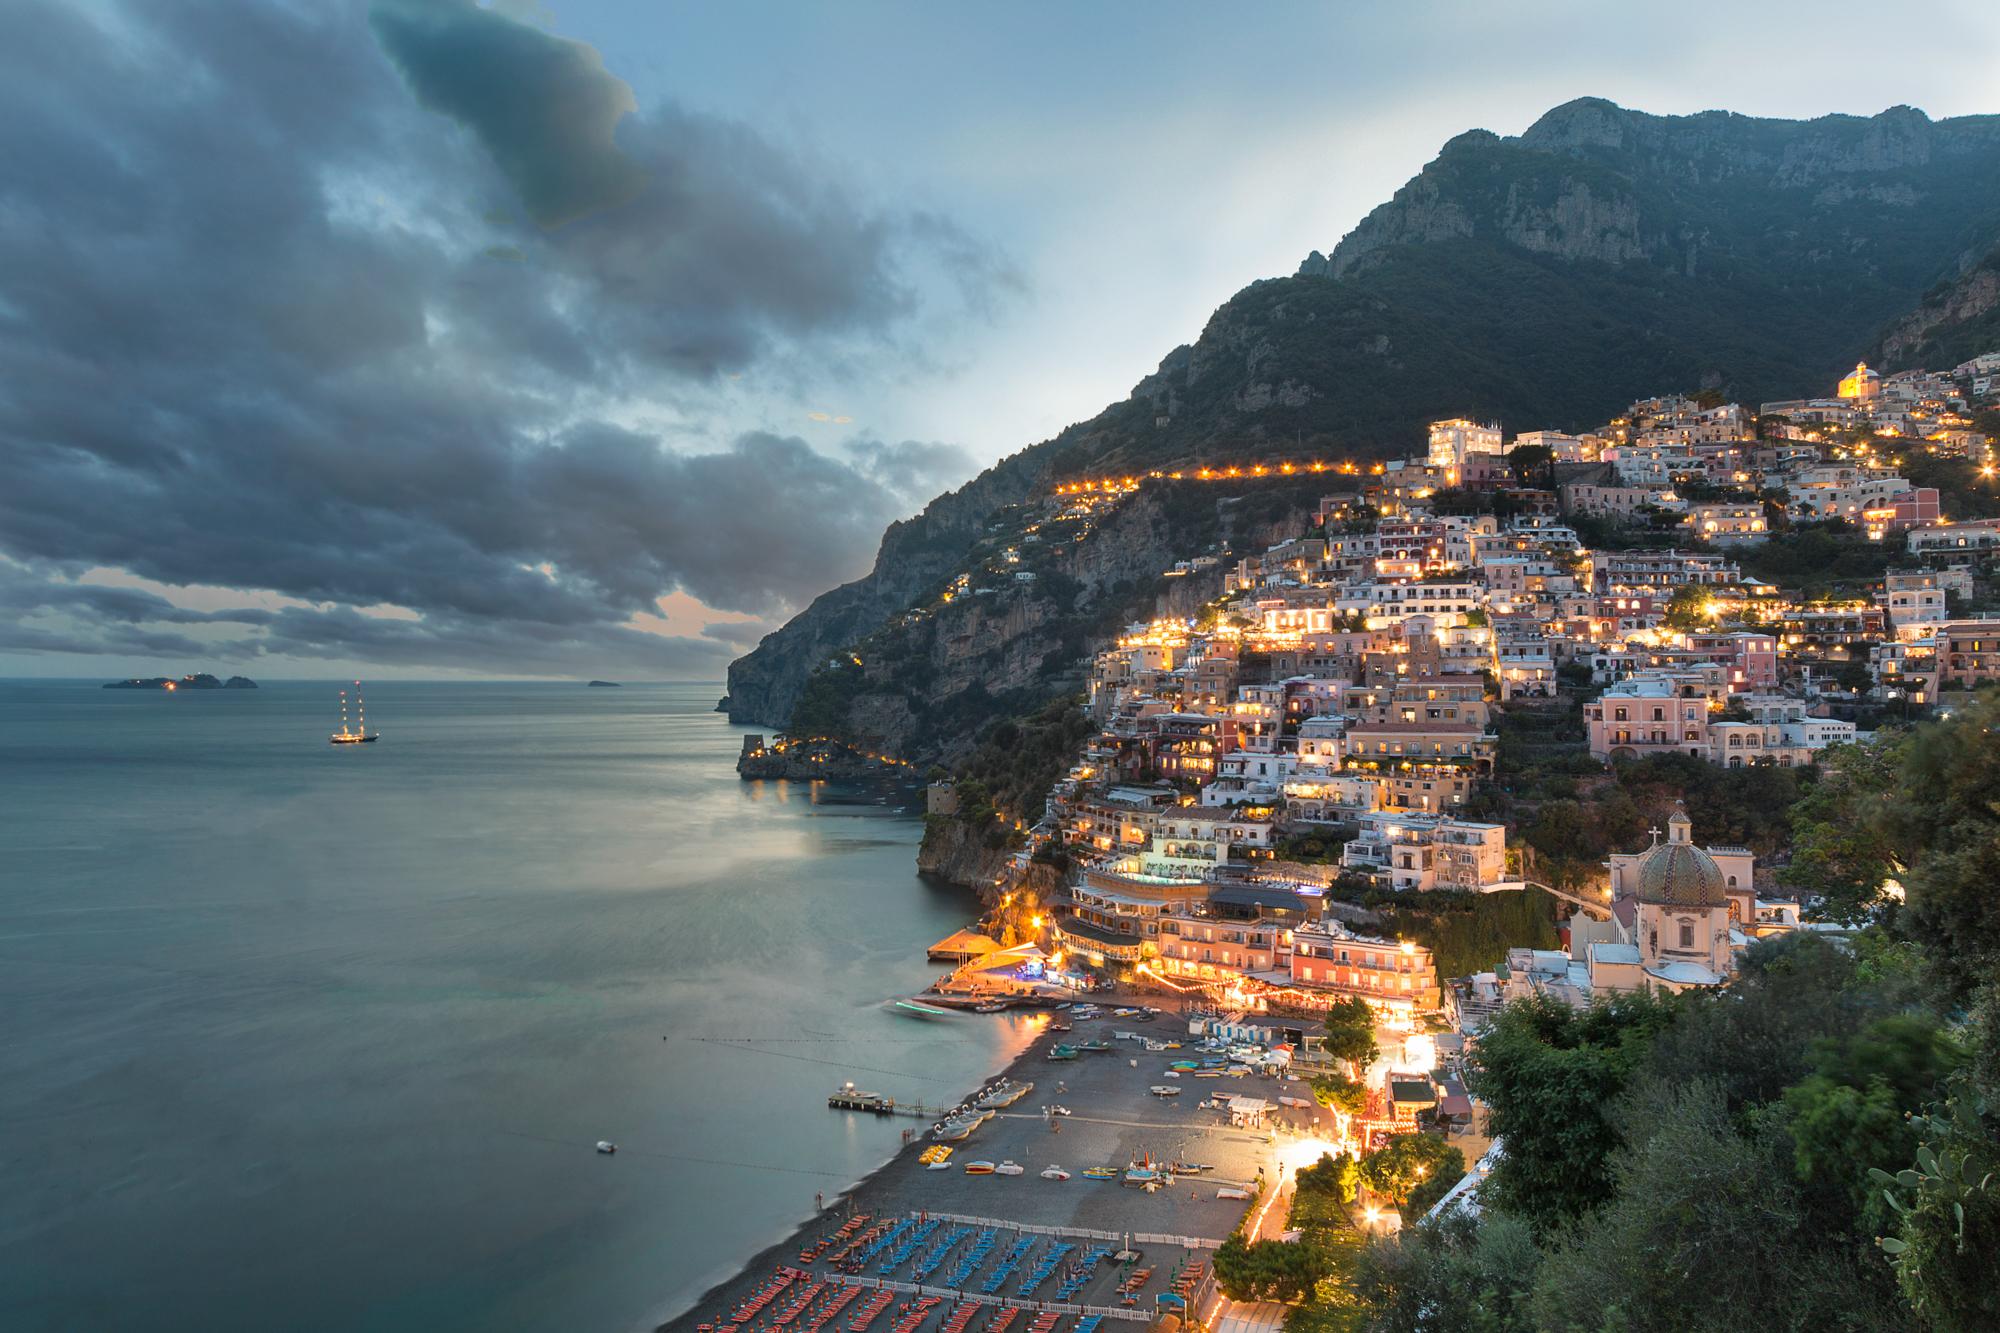 Dusk view of Positano, on the Amalfi Coast, Italy